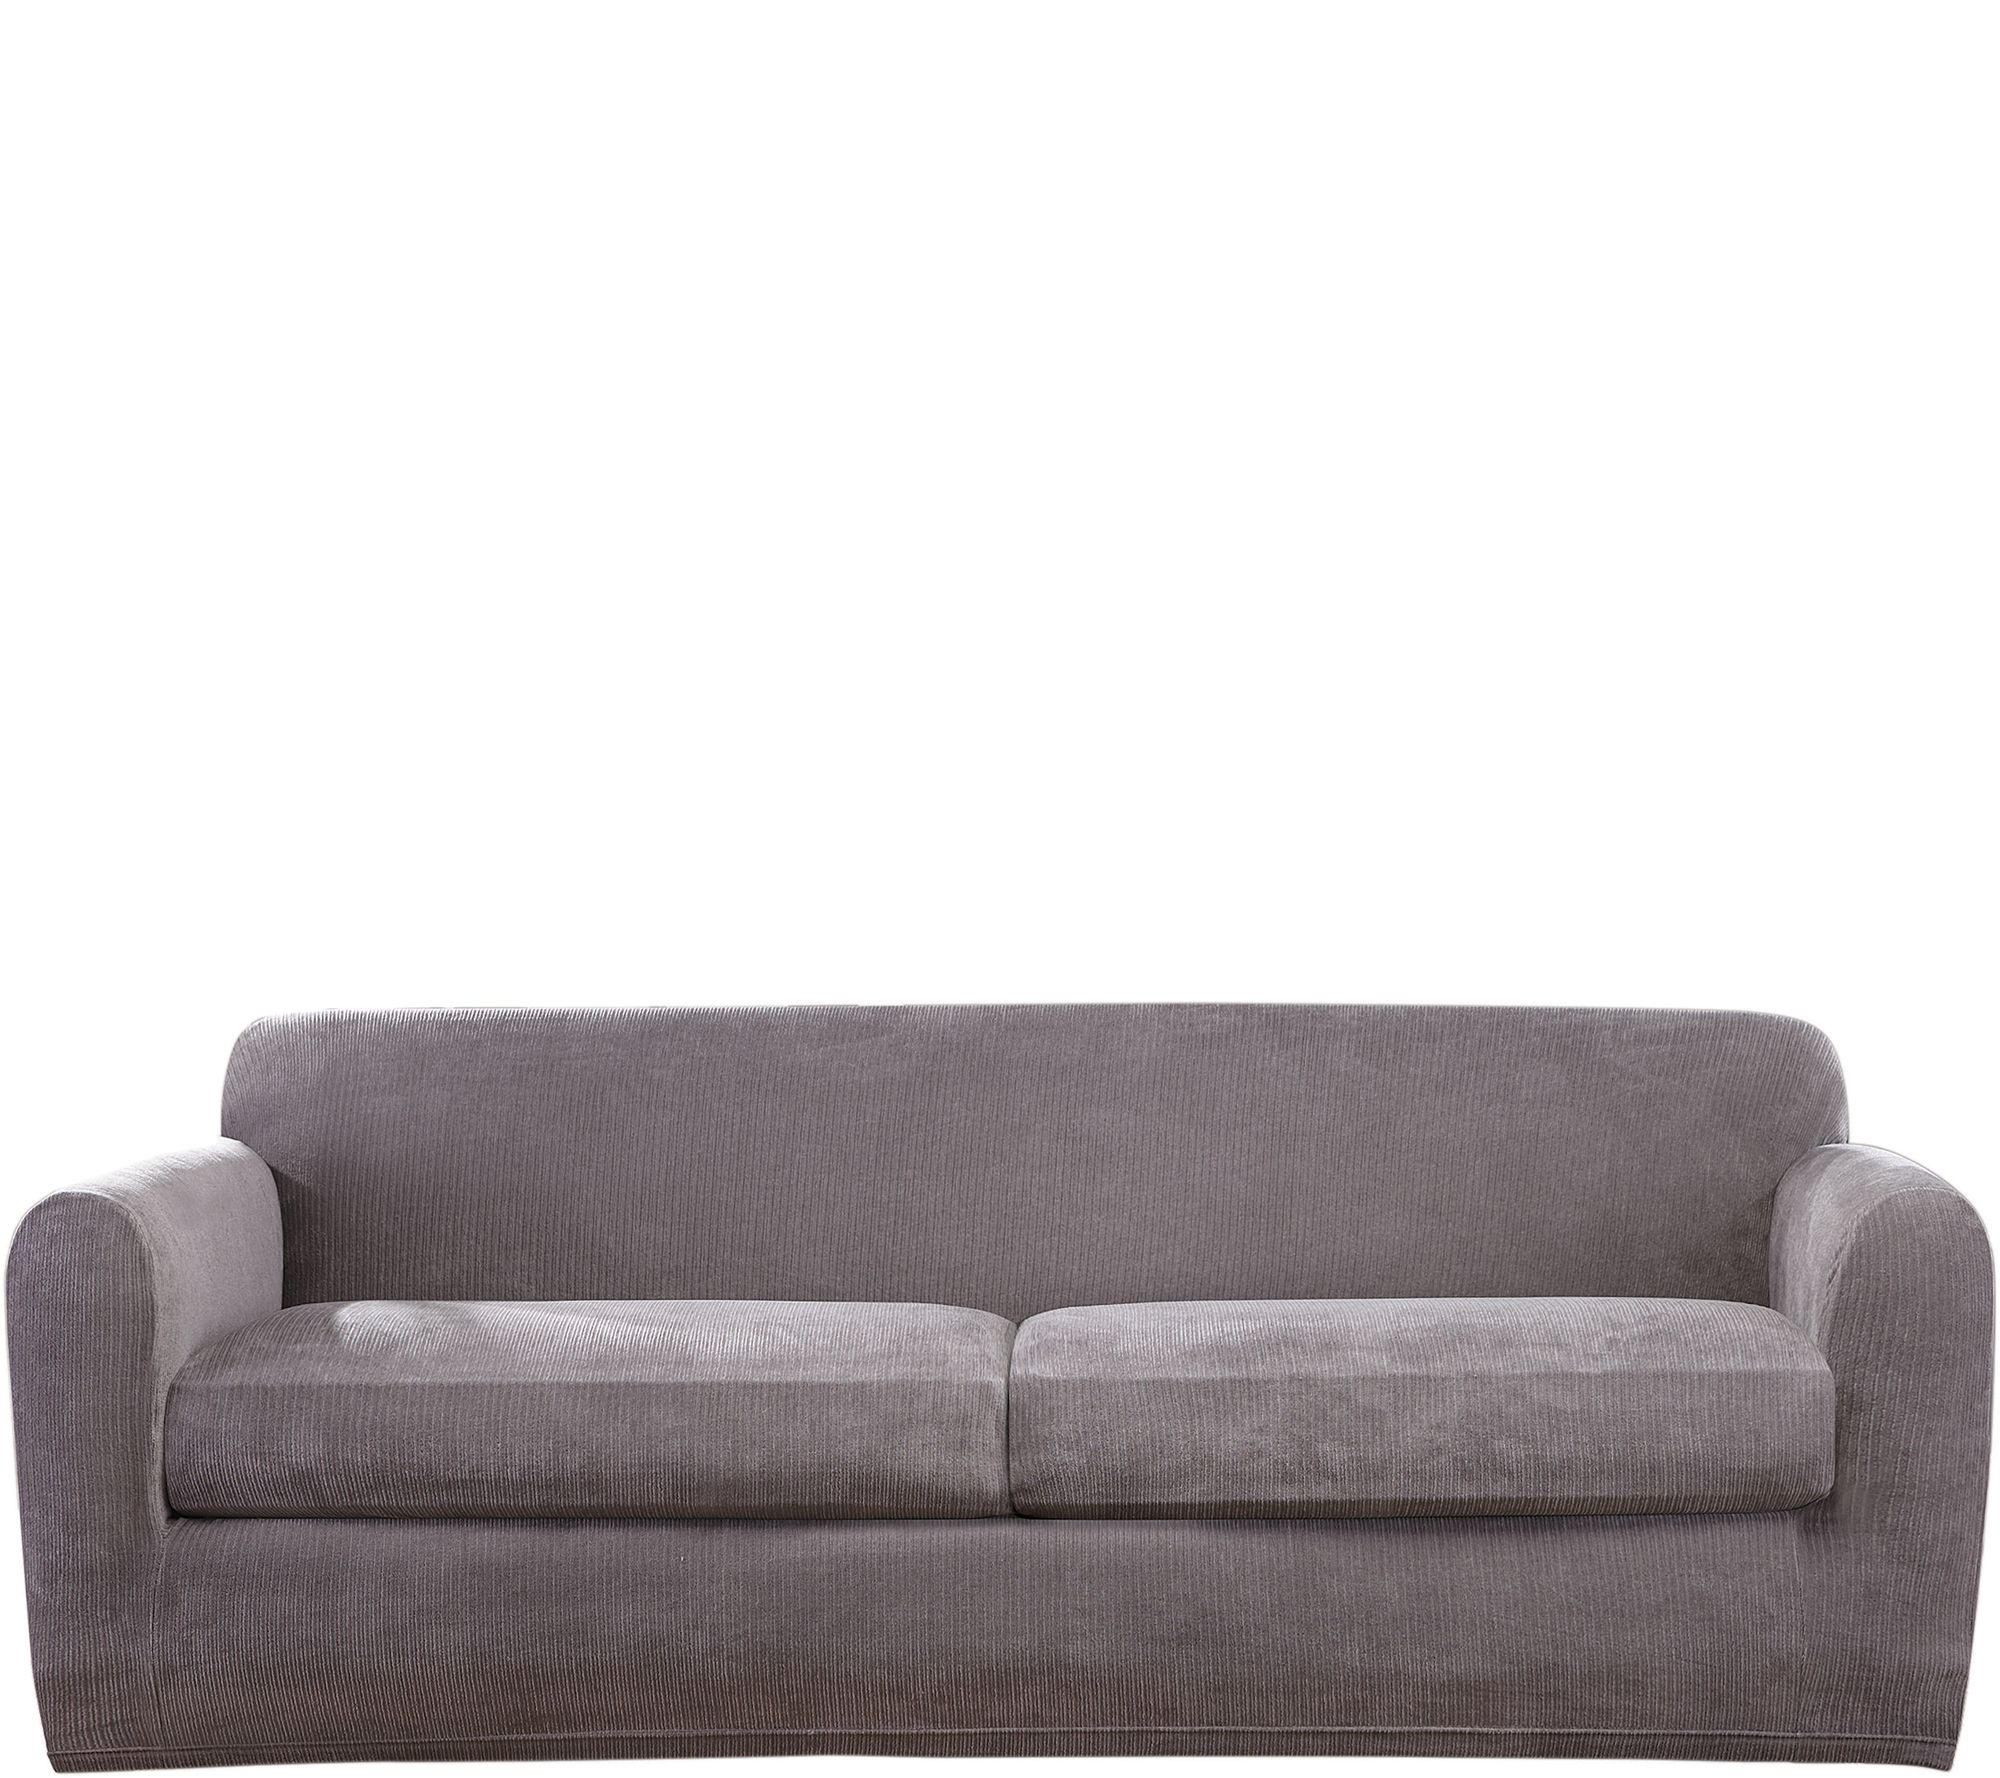 ... 2 Cushion Sofa Slipcover. Product Thumbnail. Price: $164.99